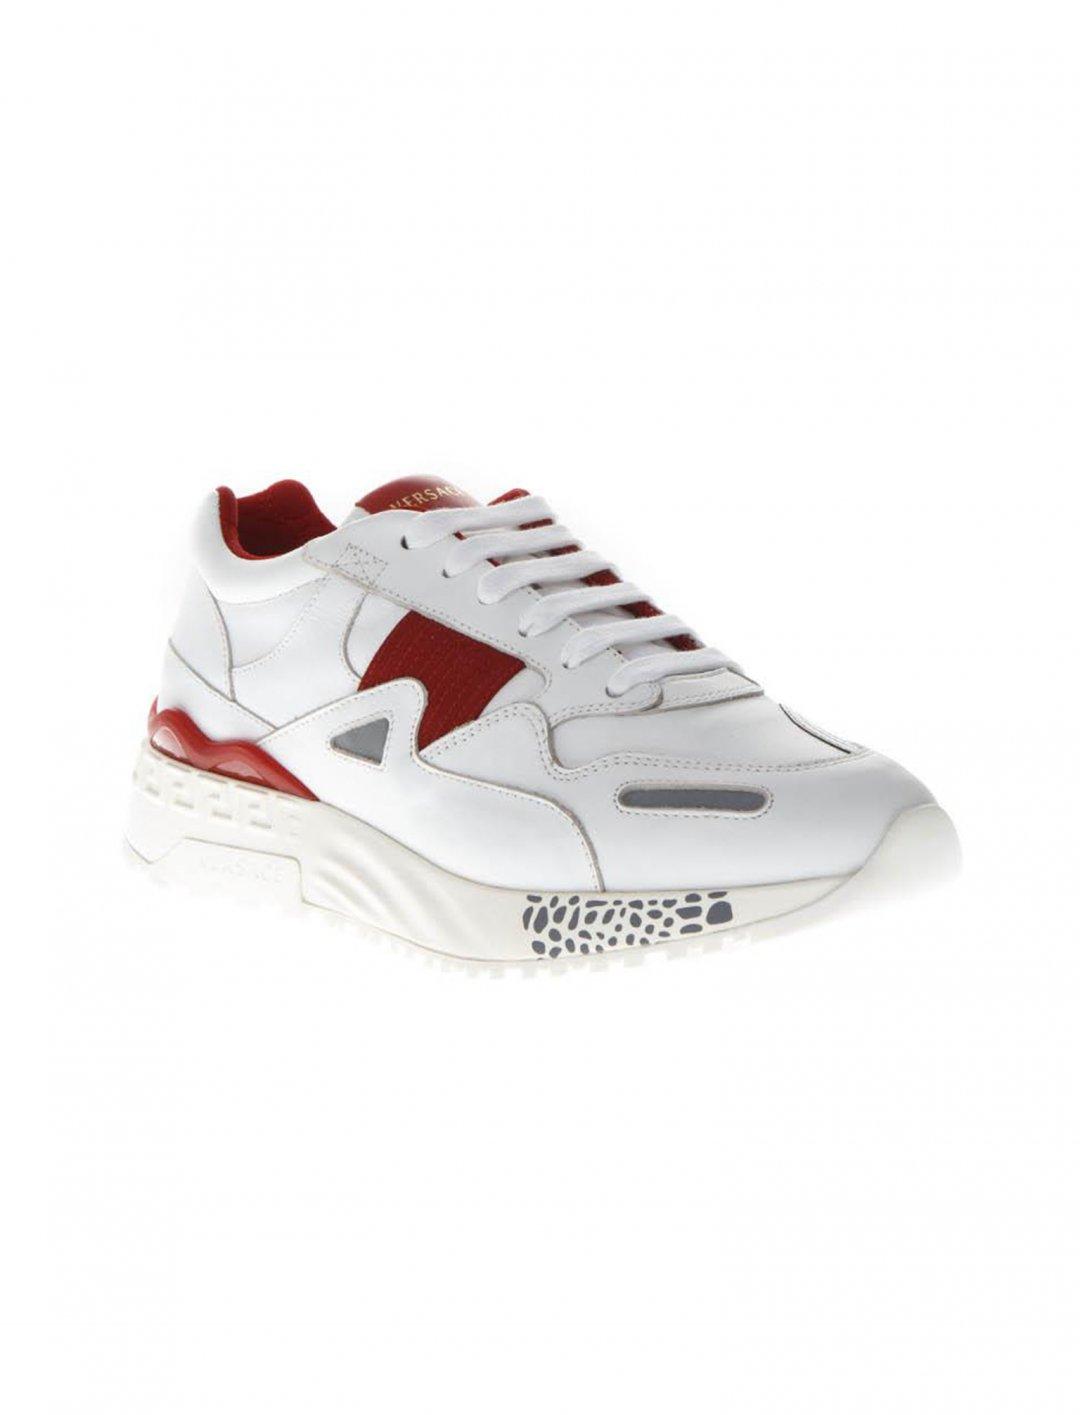 Fedez' Sneakers Shoes Versus Versace